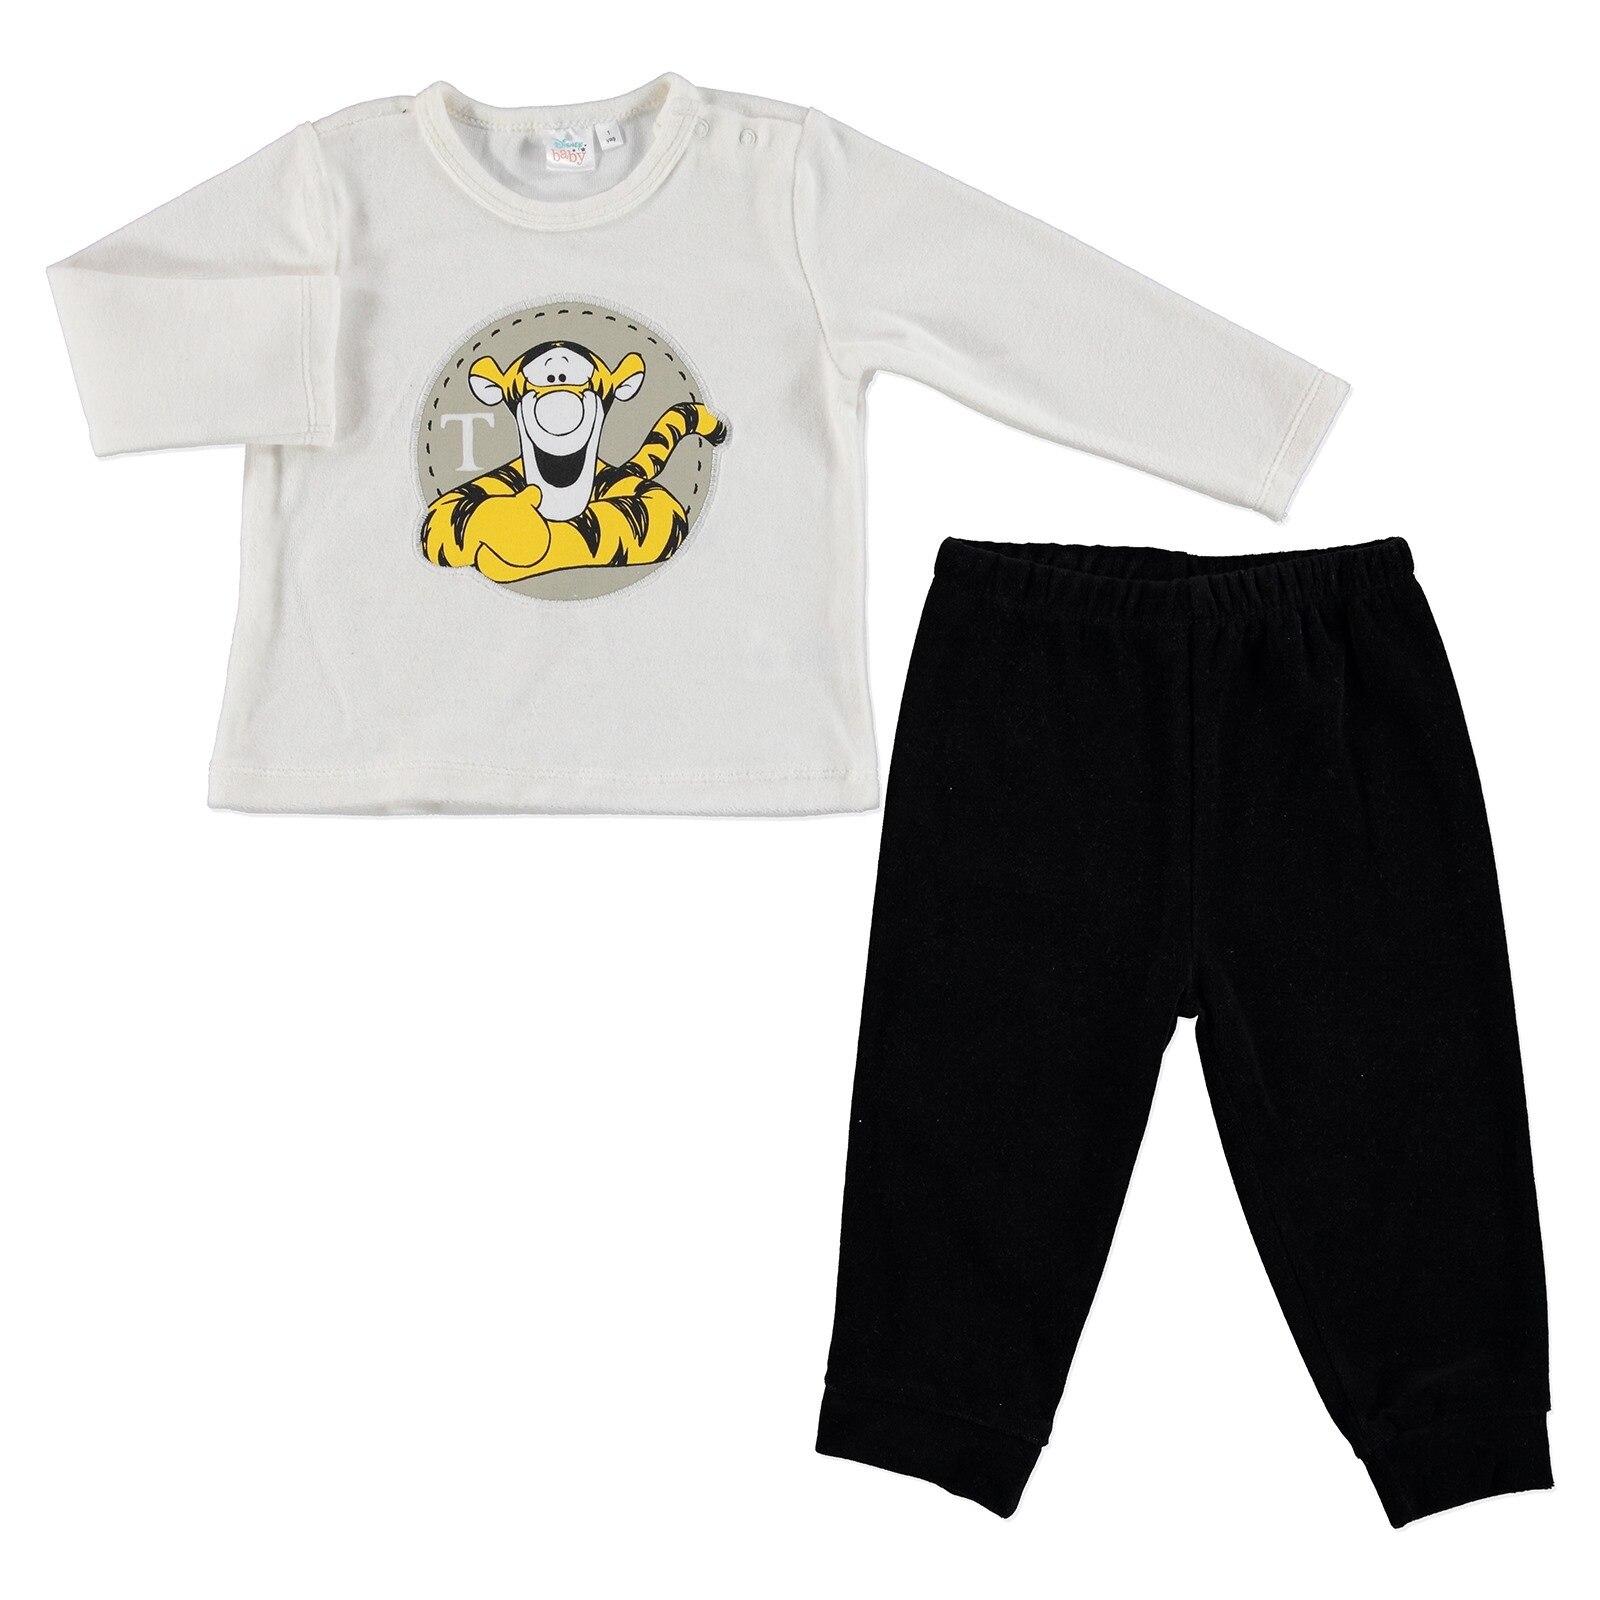 Ebebek Disney Winnie The Pooh Licensed Velvet Tracksuit Set